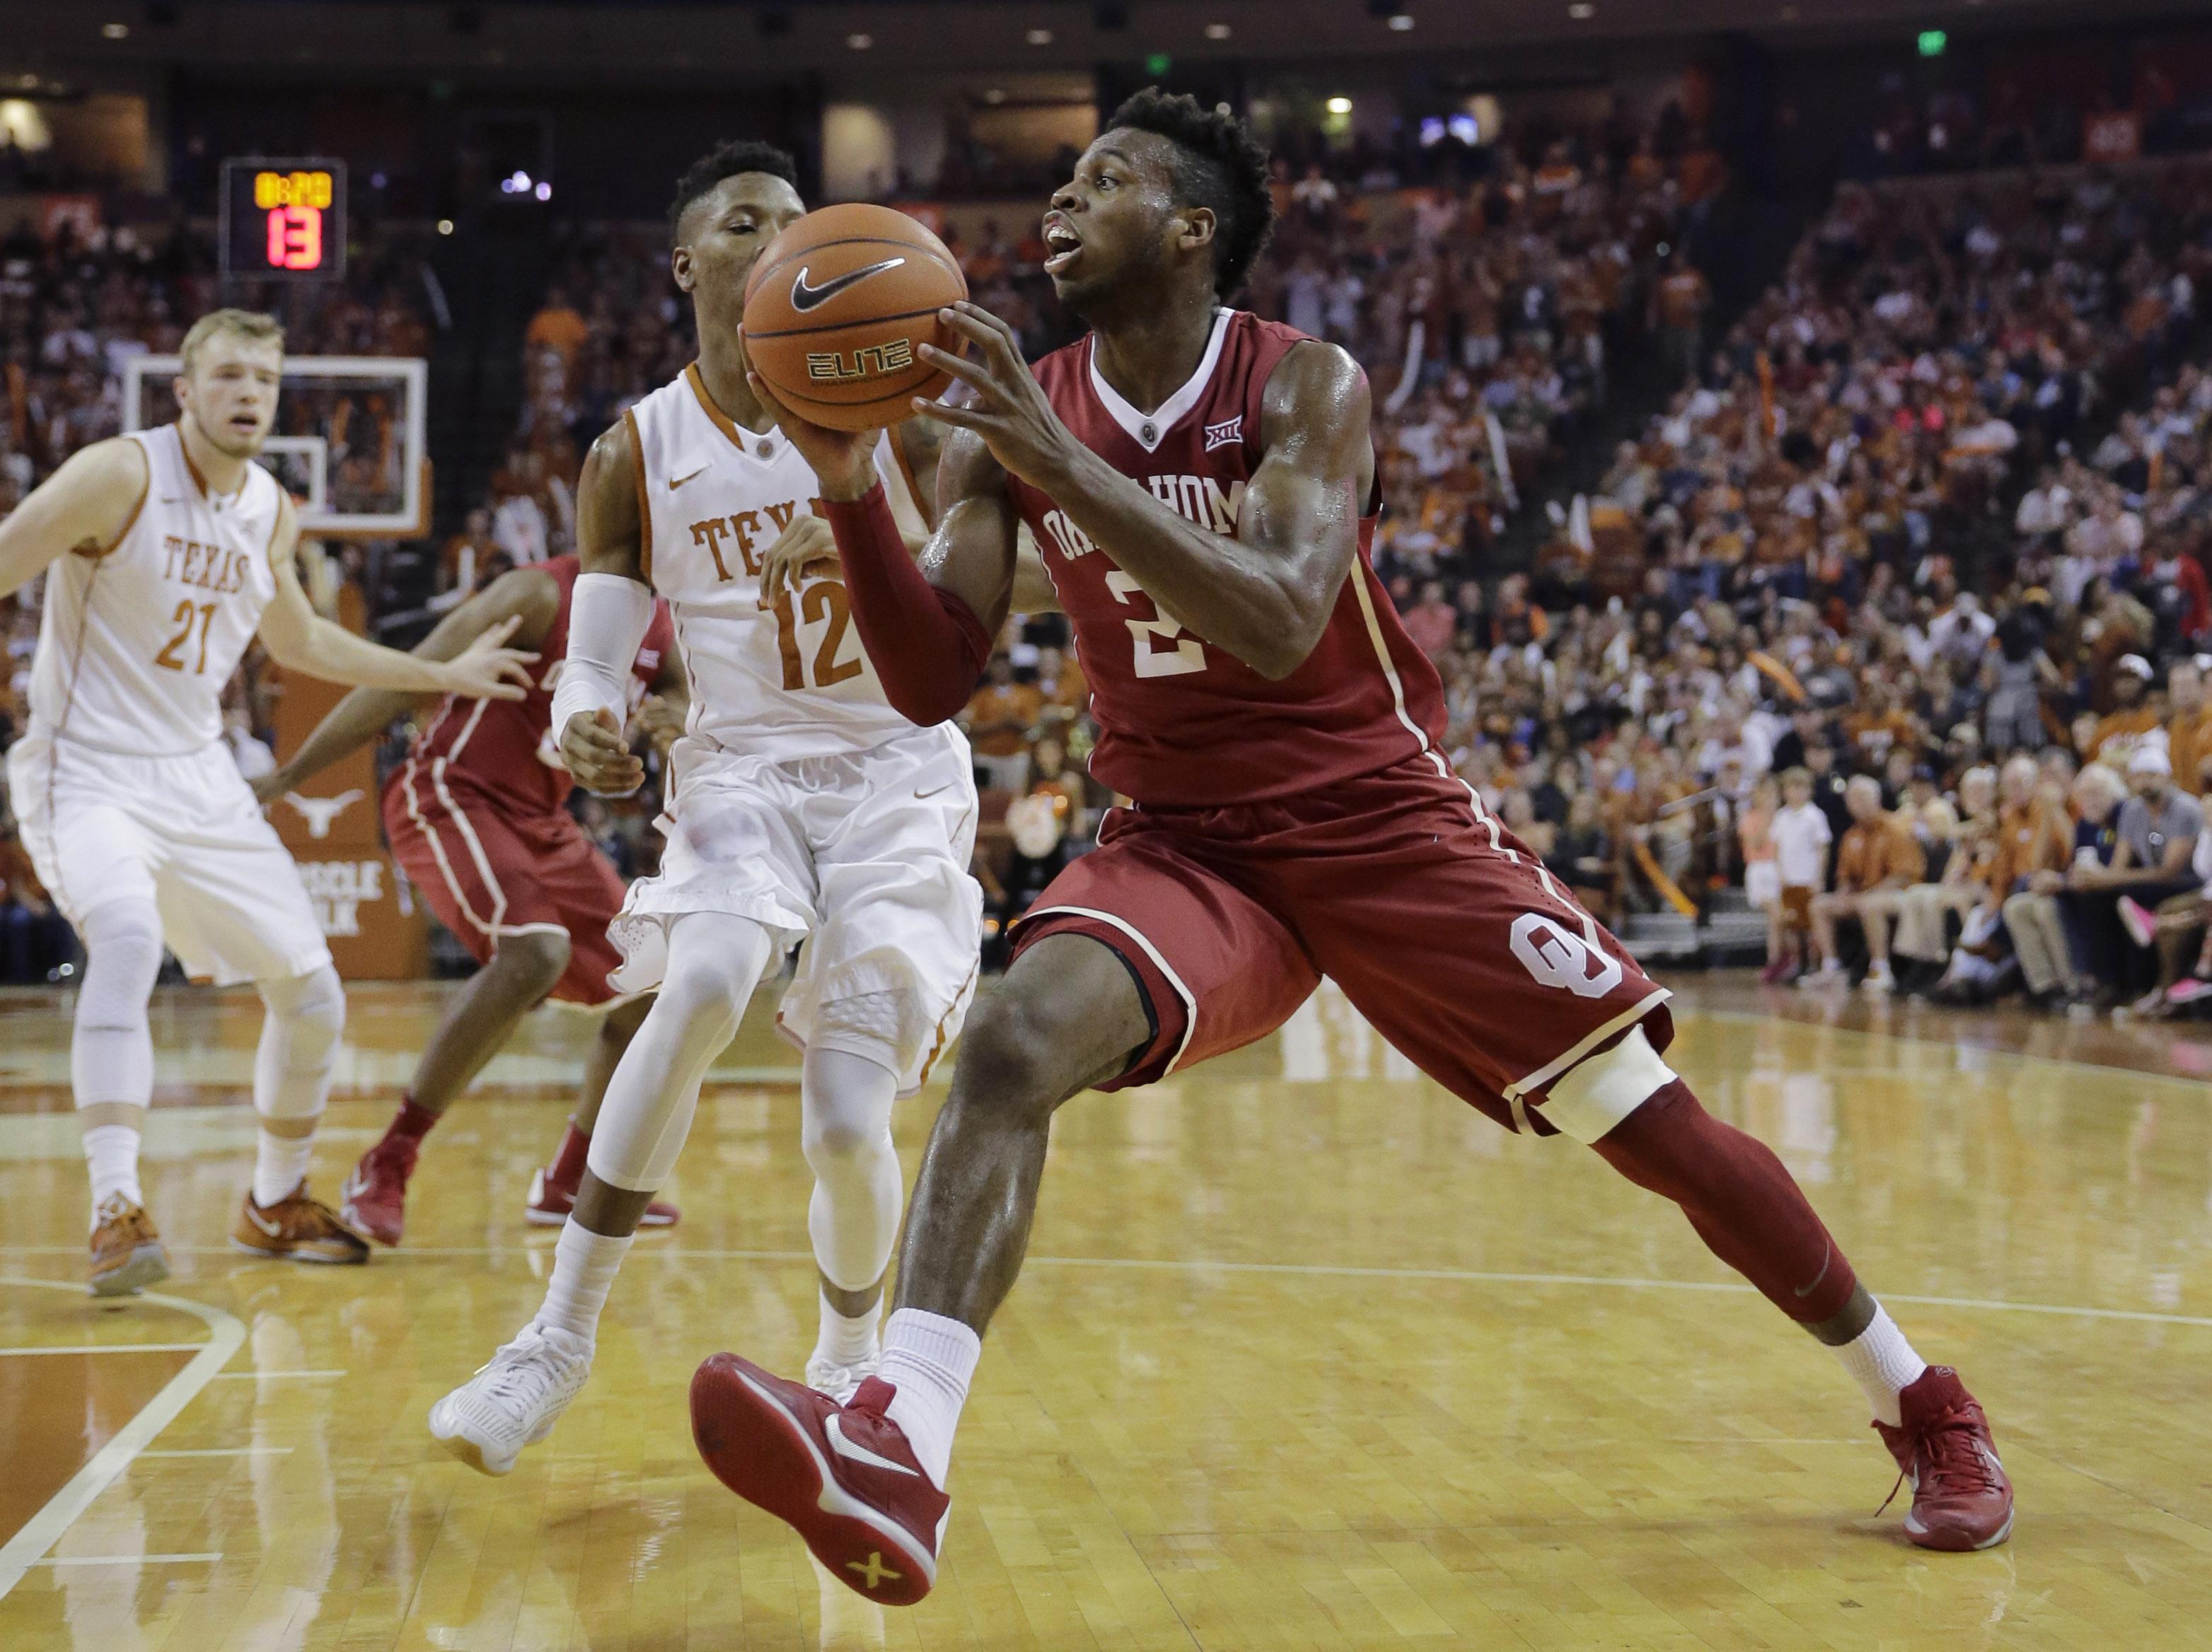 Oklahoma forward Khadeem Lattin (12) drives the ball around Texas guard Kerwin Roach Jr. (12) during the first half of an NCAA college basketball game, Saturday, Feb. 27, 2016, in Austin, Texas. (AP Photo/Eric Gay)